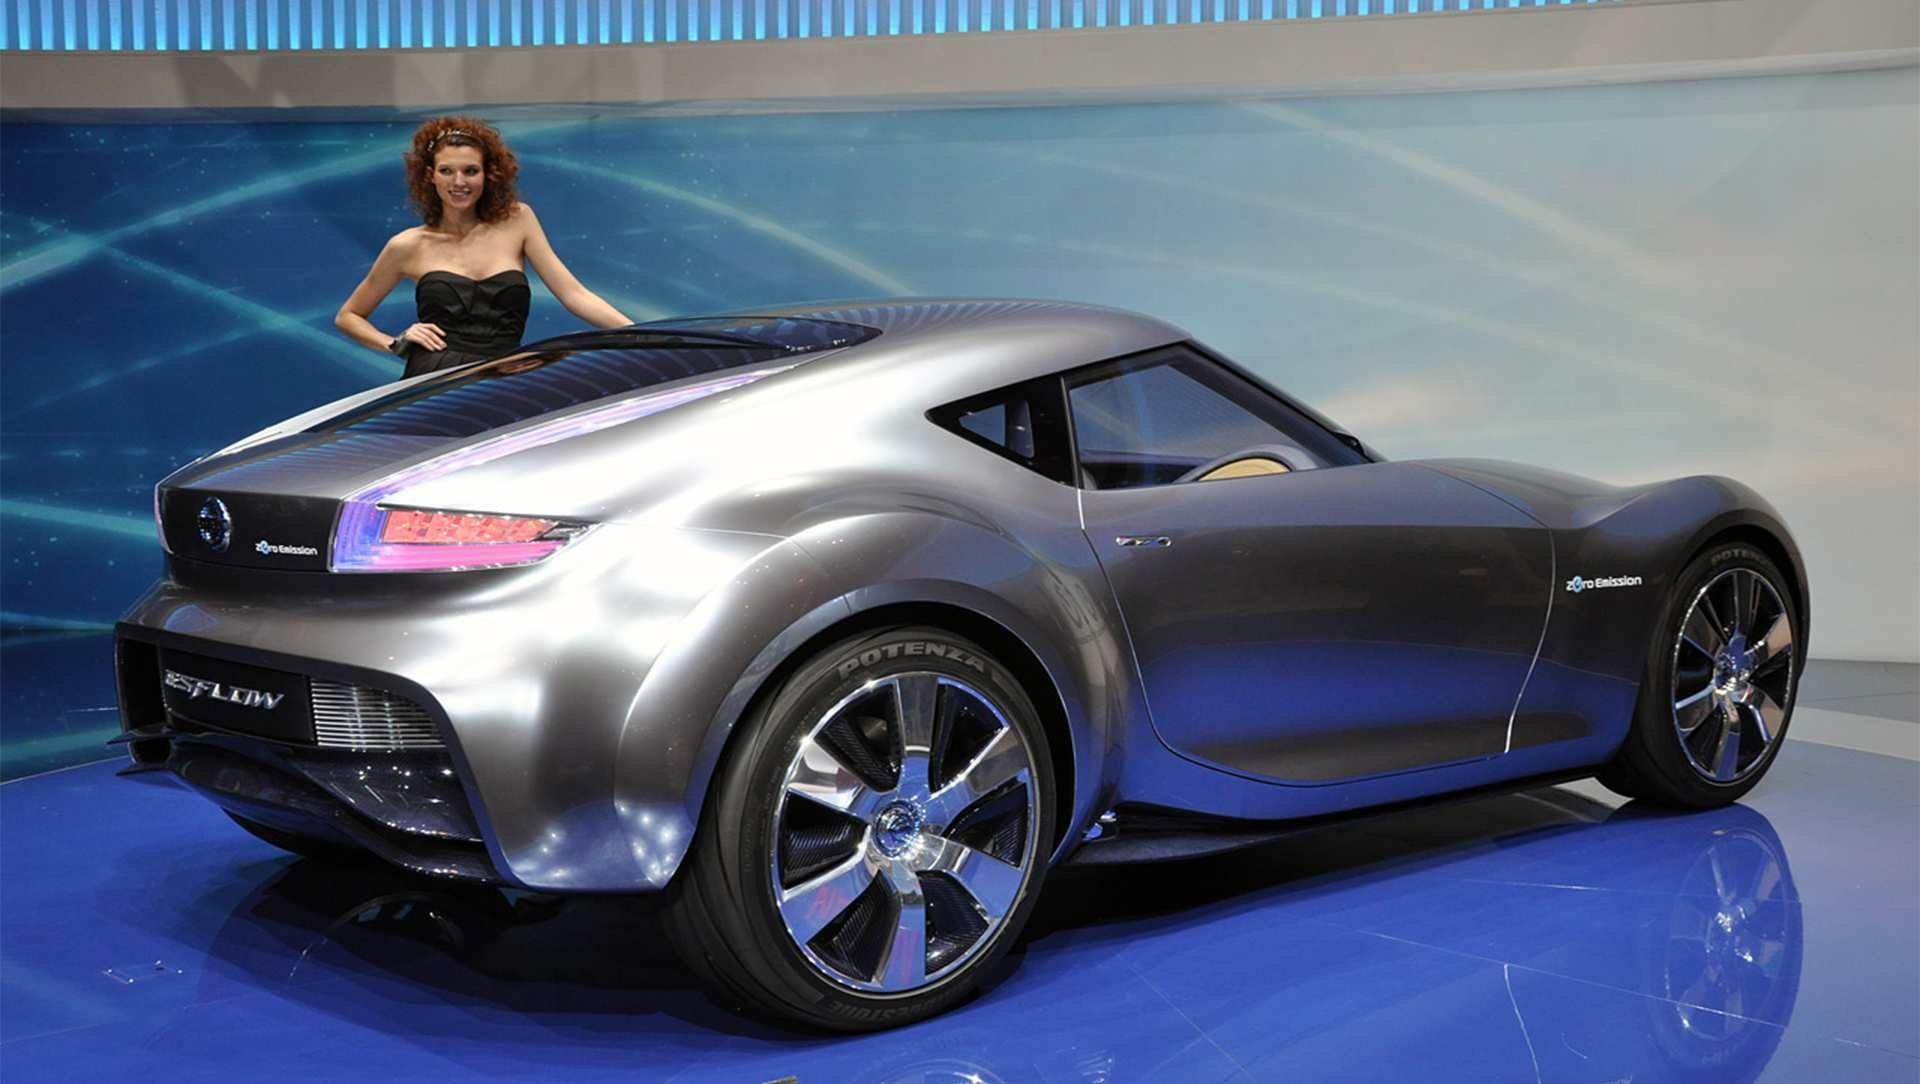 2021 Nissan Z35 Concept In 2020 Nissan Nissan Z Cars New Nissan Z